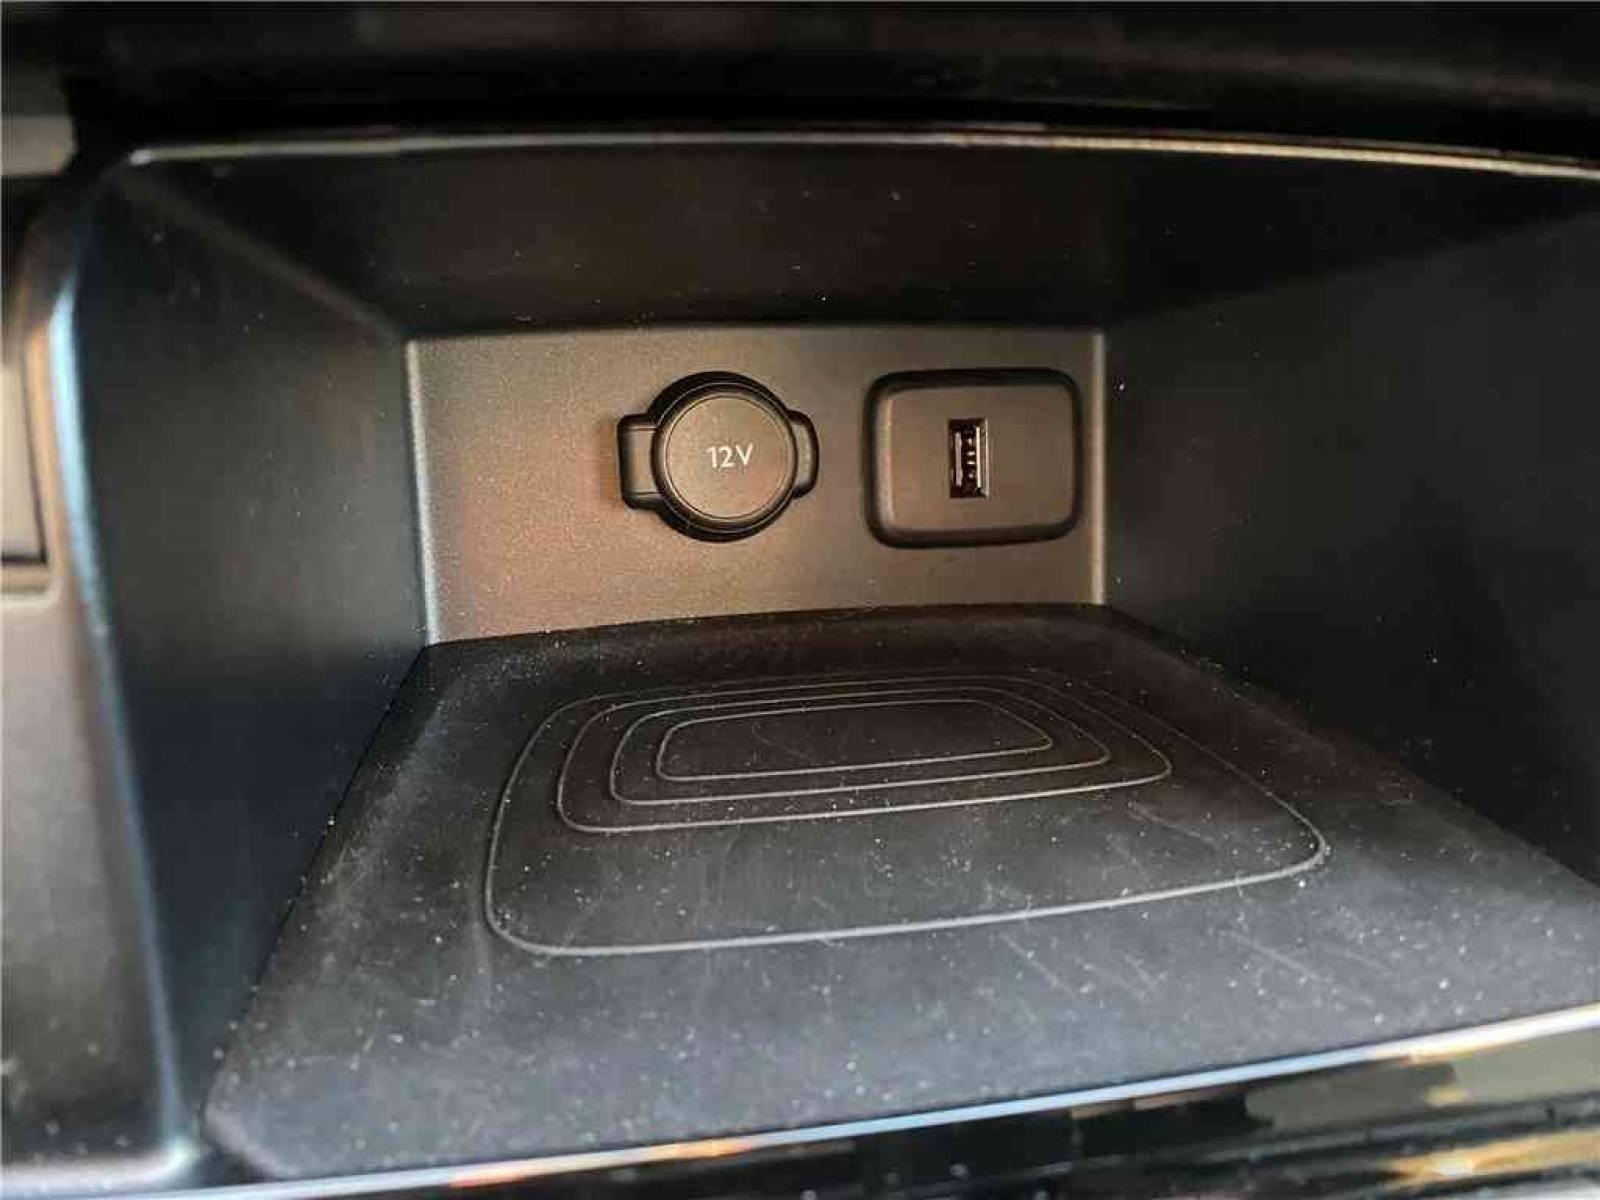 OPEL Grandland X 1.5 Diesel 130 ch BVA8 - véhicule d'occasion - Groupe Guillet - Opel Magicauto - Chalon-sur-Saône - 71380 - Saint-Marcel - 17